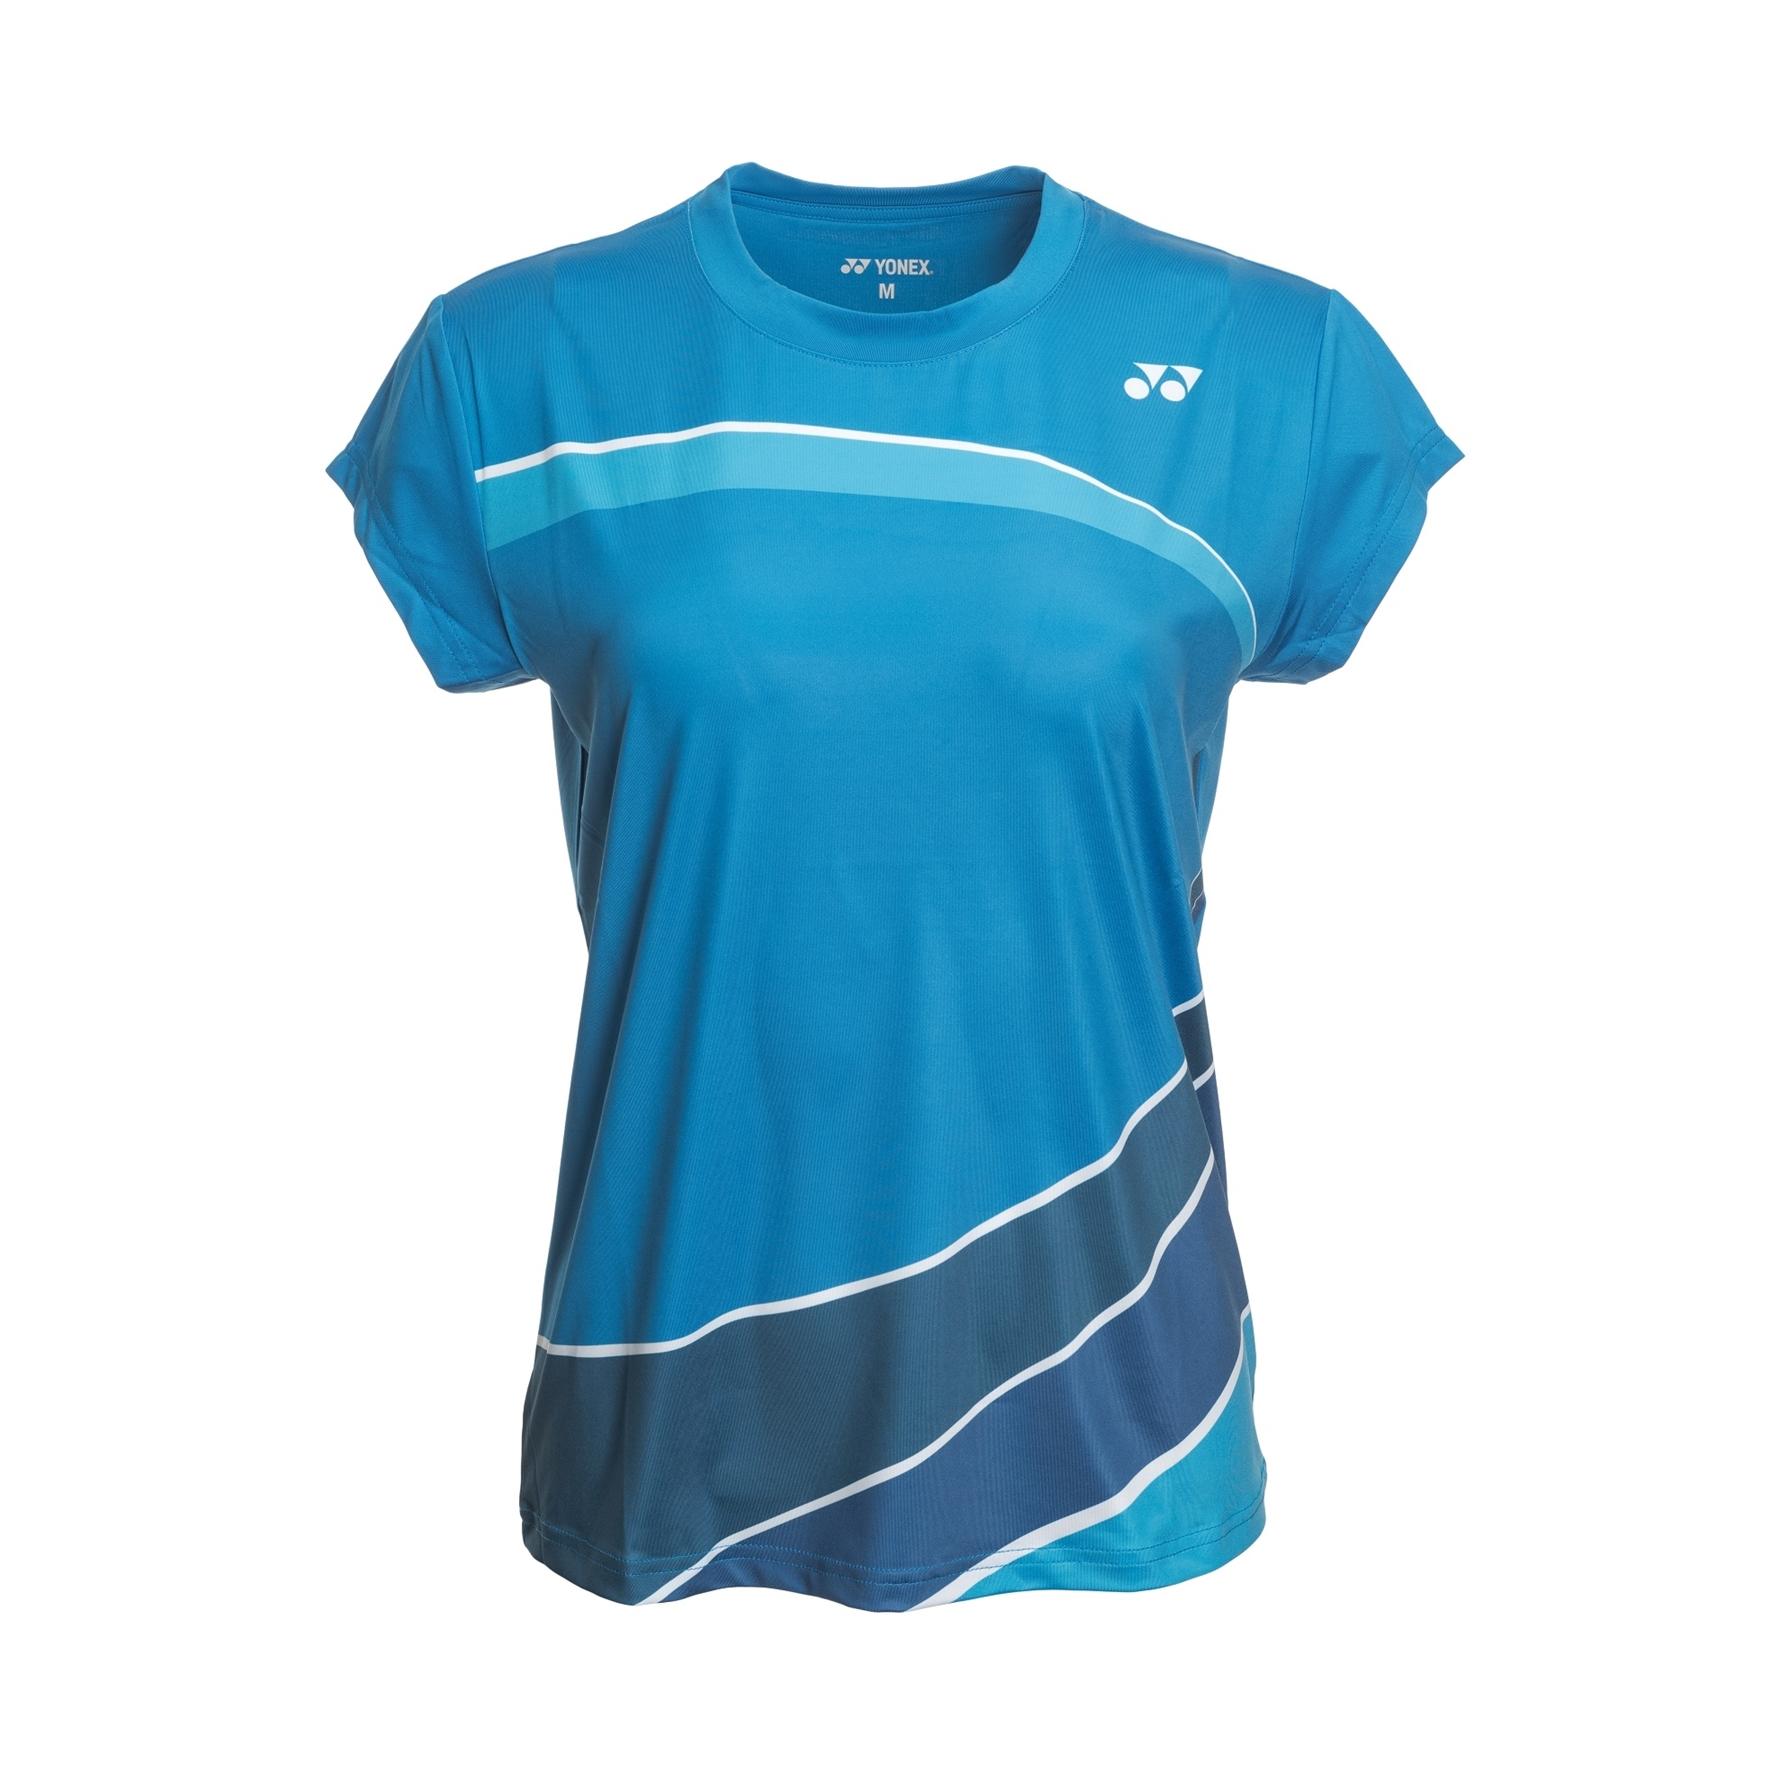 Yonex Poloshirt 20625 Women Bright Blue M